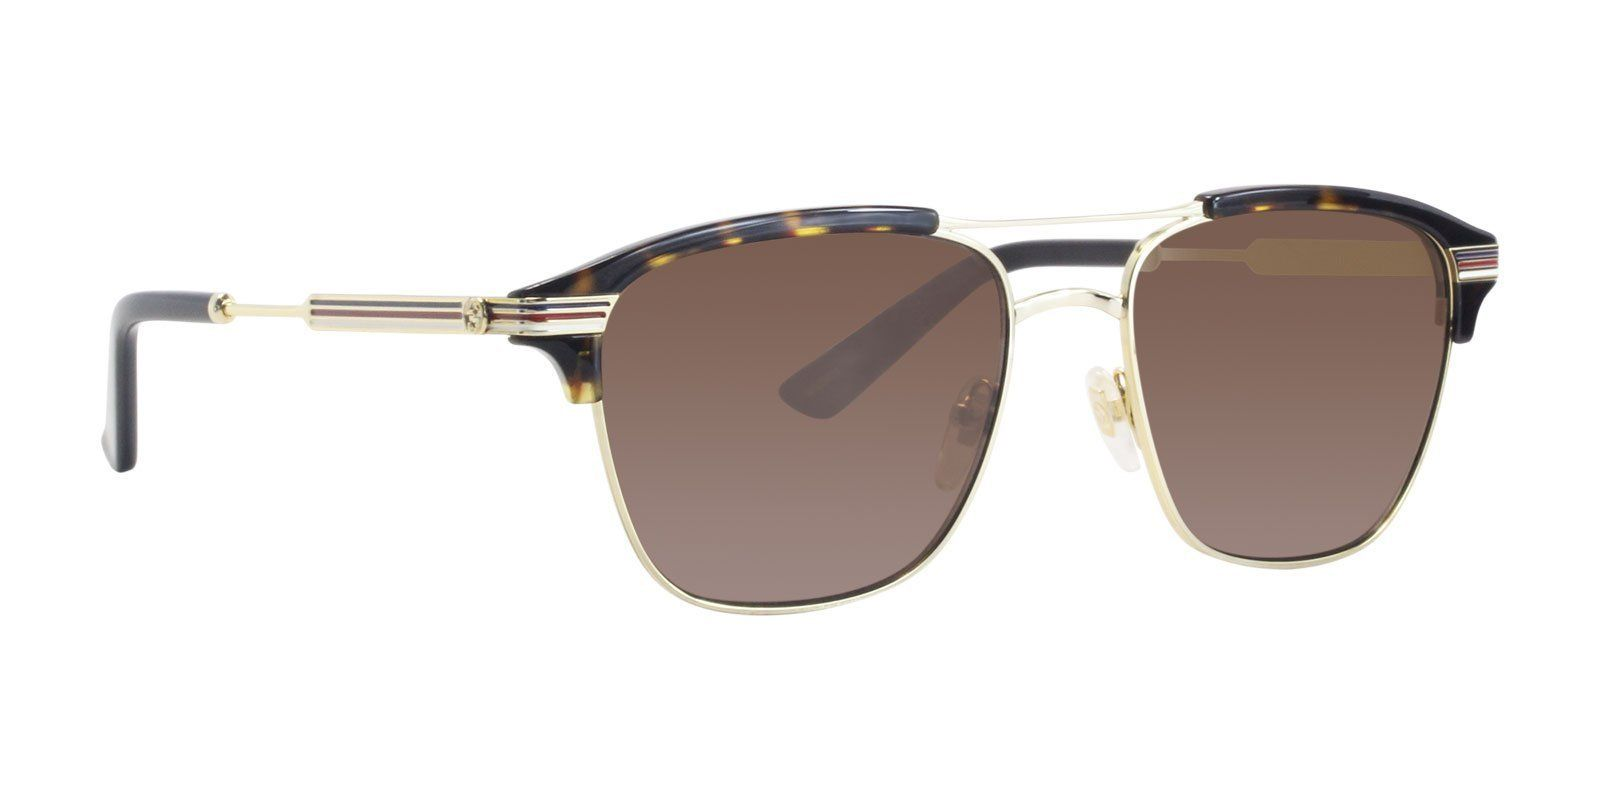 76f1a1bba3c Gucci - GG0241S 003-sunglasses-Designer Eyes